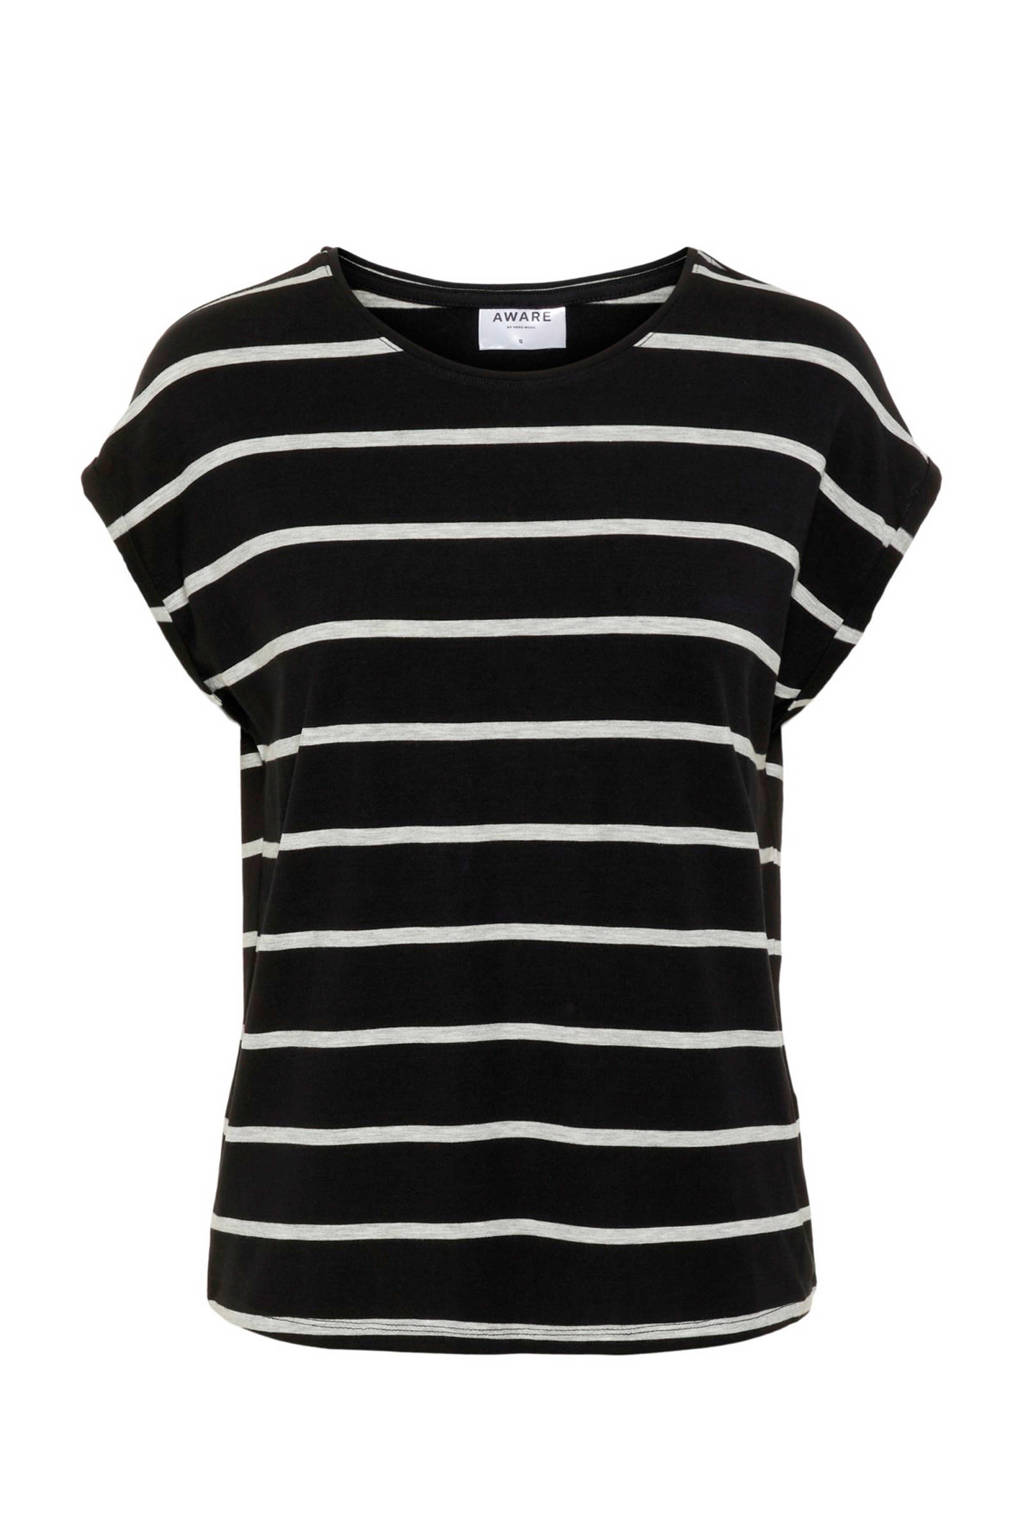 VERO MODA gestreept T-shirt zwart/ecru, Zwart/ecru